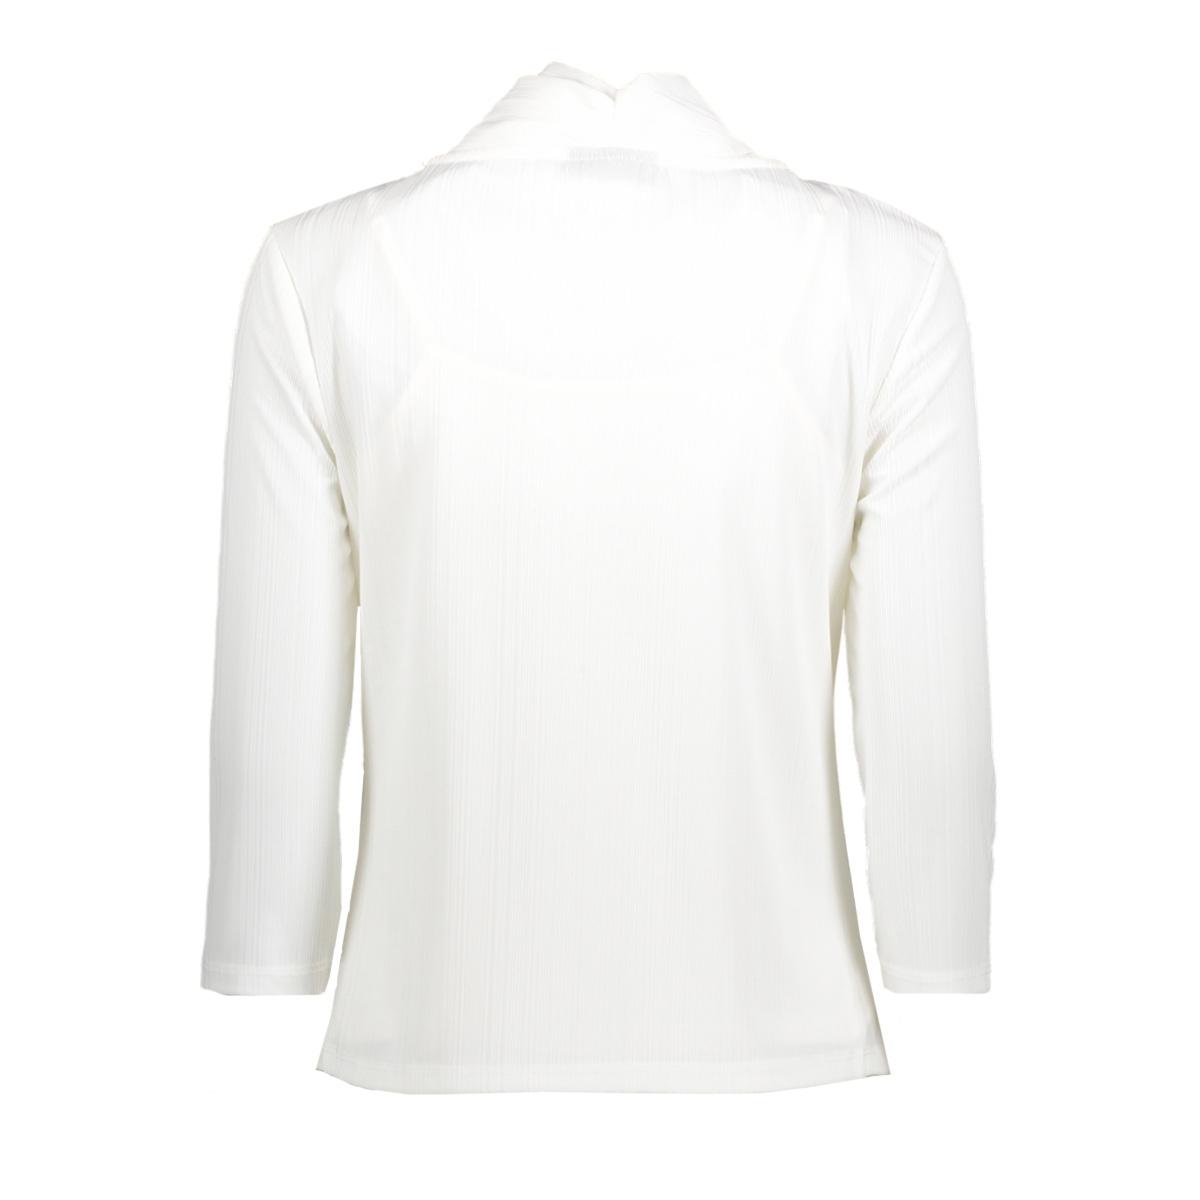 objcosma 3/4 top 94 23025542 object blouse gardenia